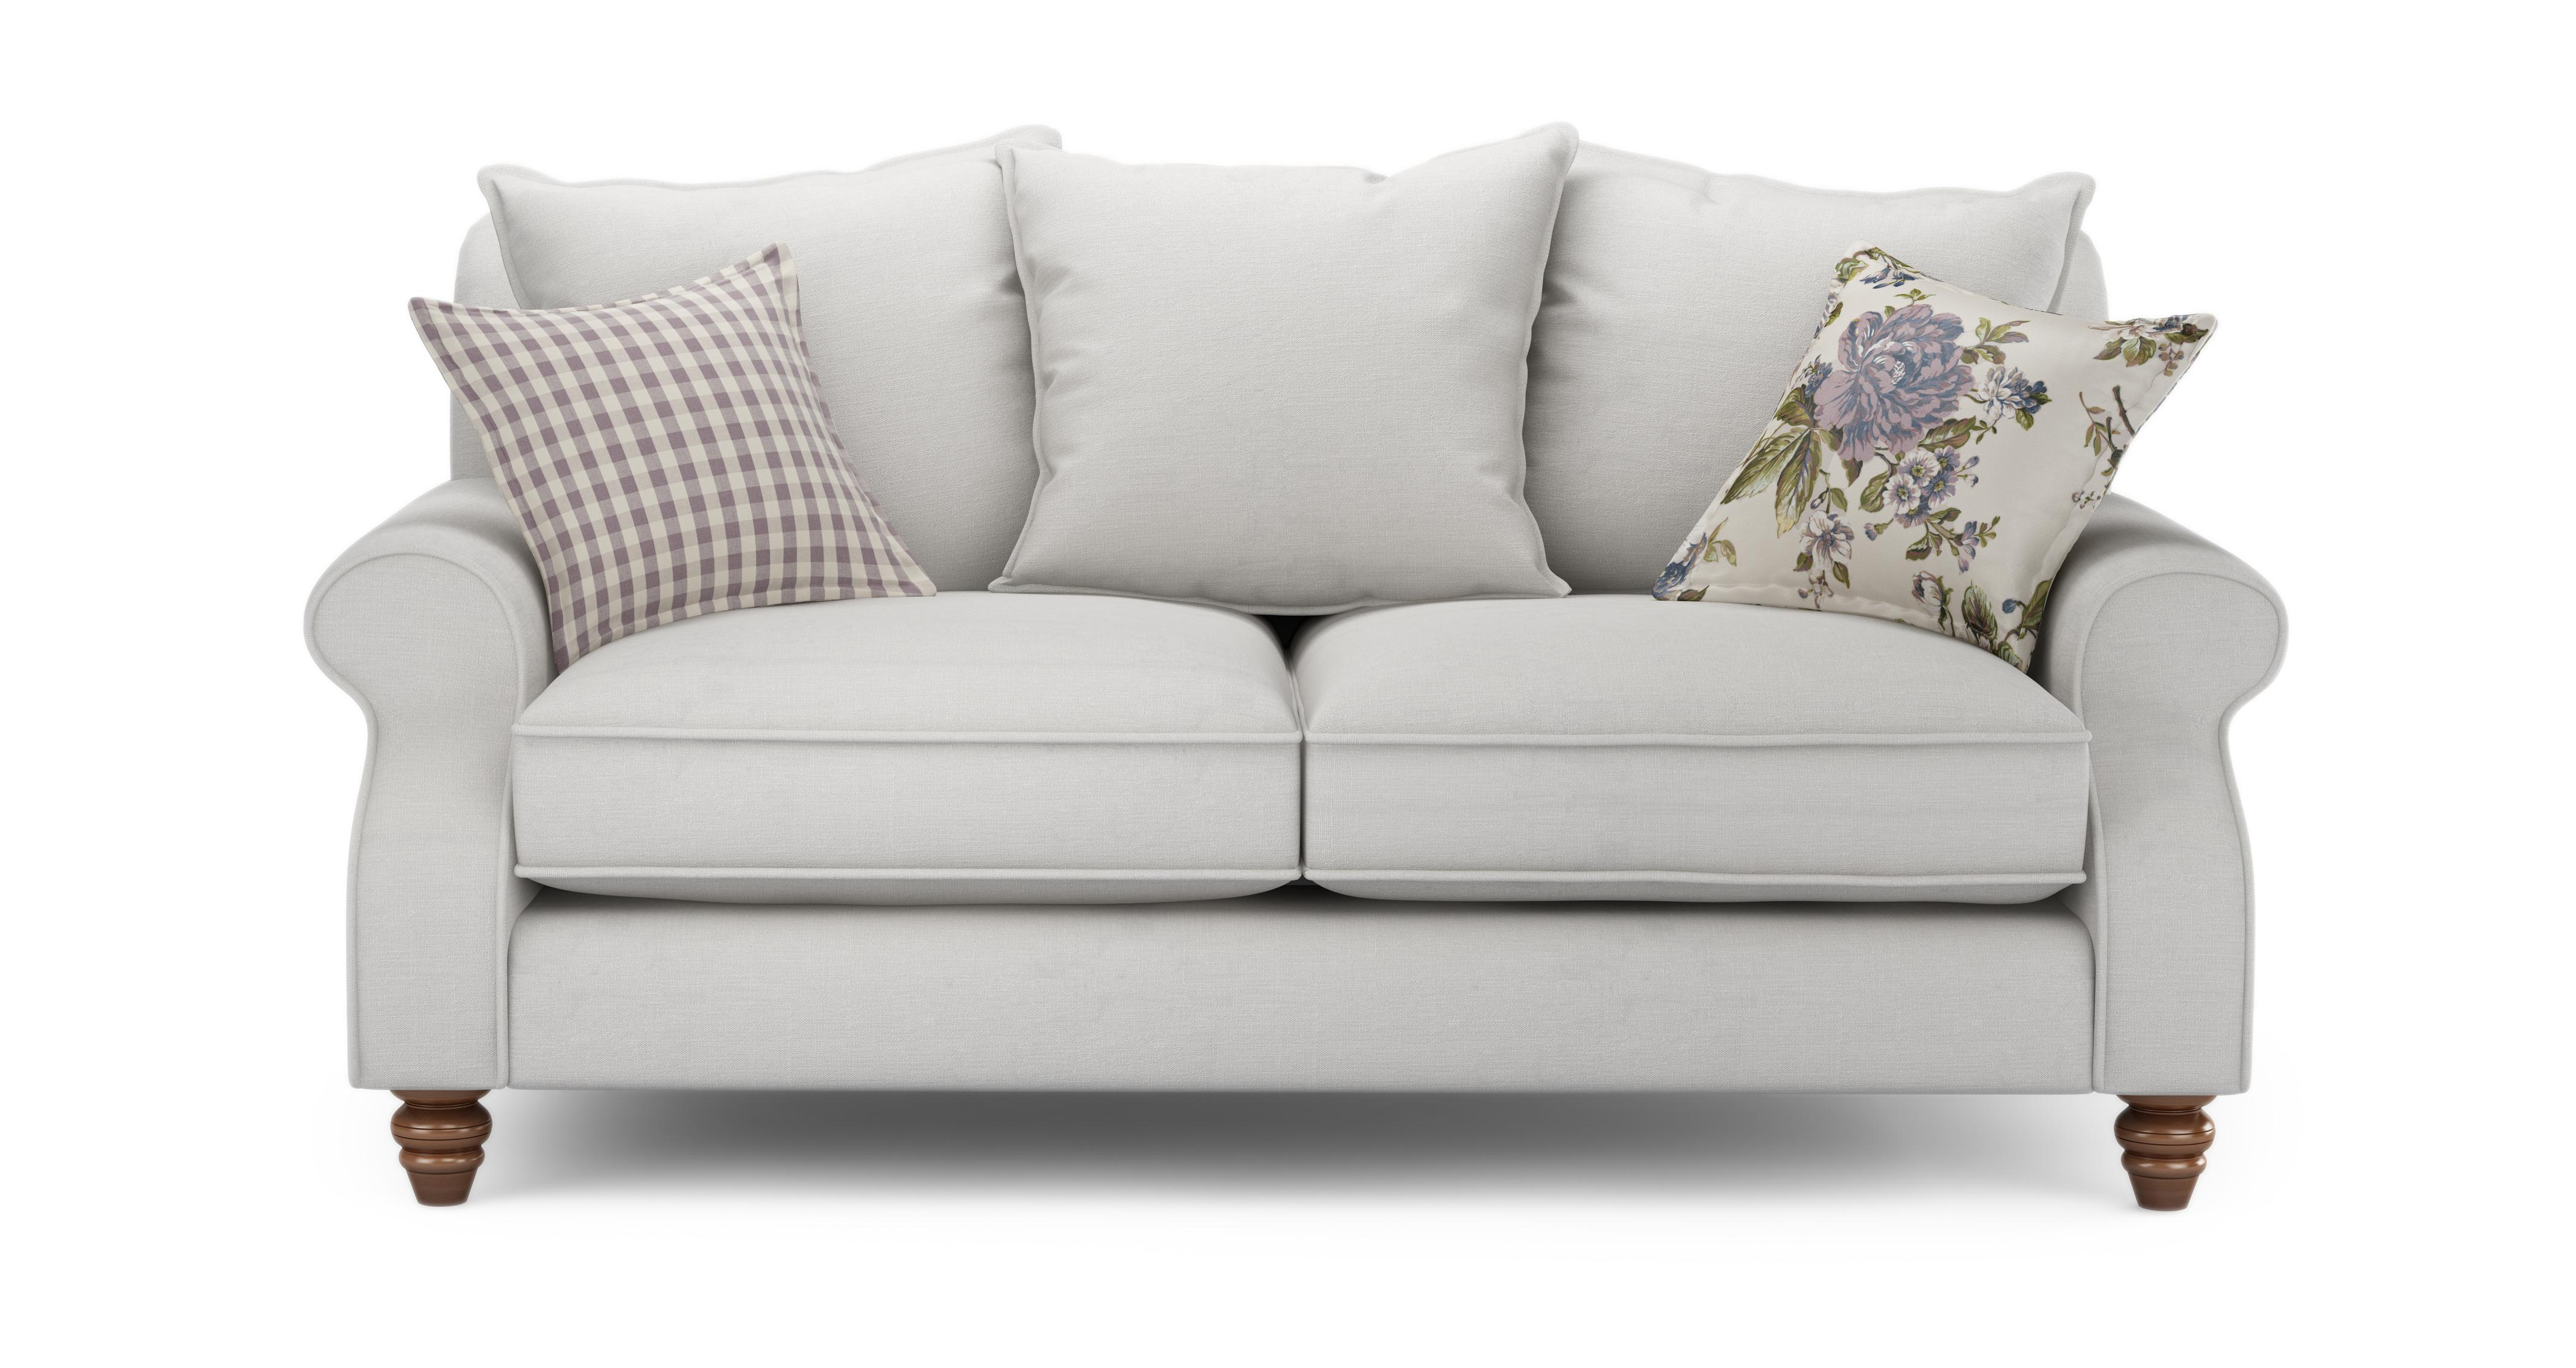 Terrific Ellie Plain 2 Seater Sofa Caraccident5 Cool Chair Designs And Ideas Caraccident5Info